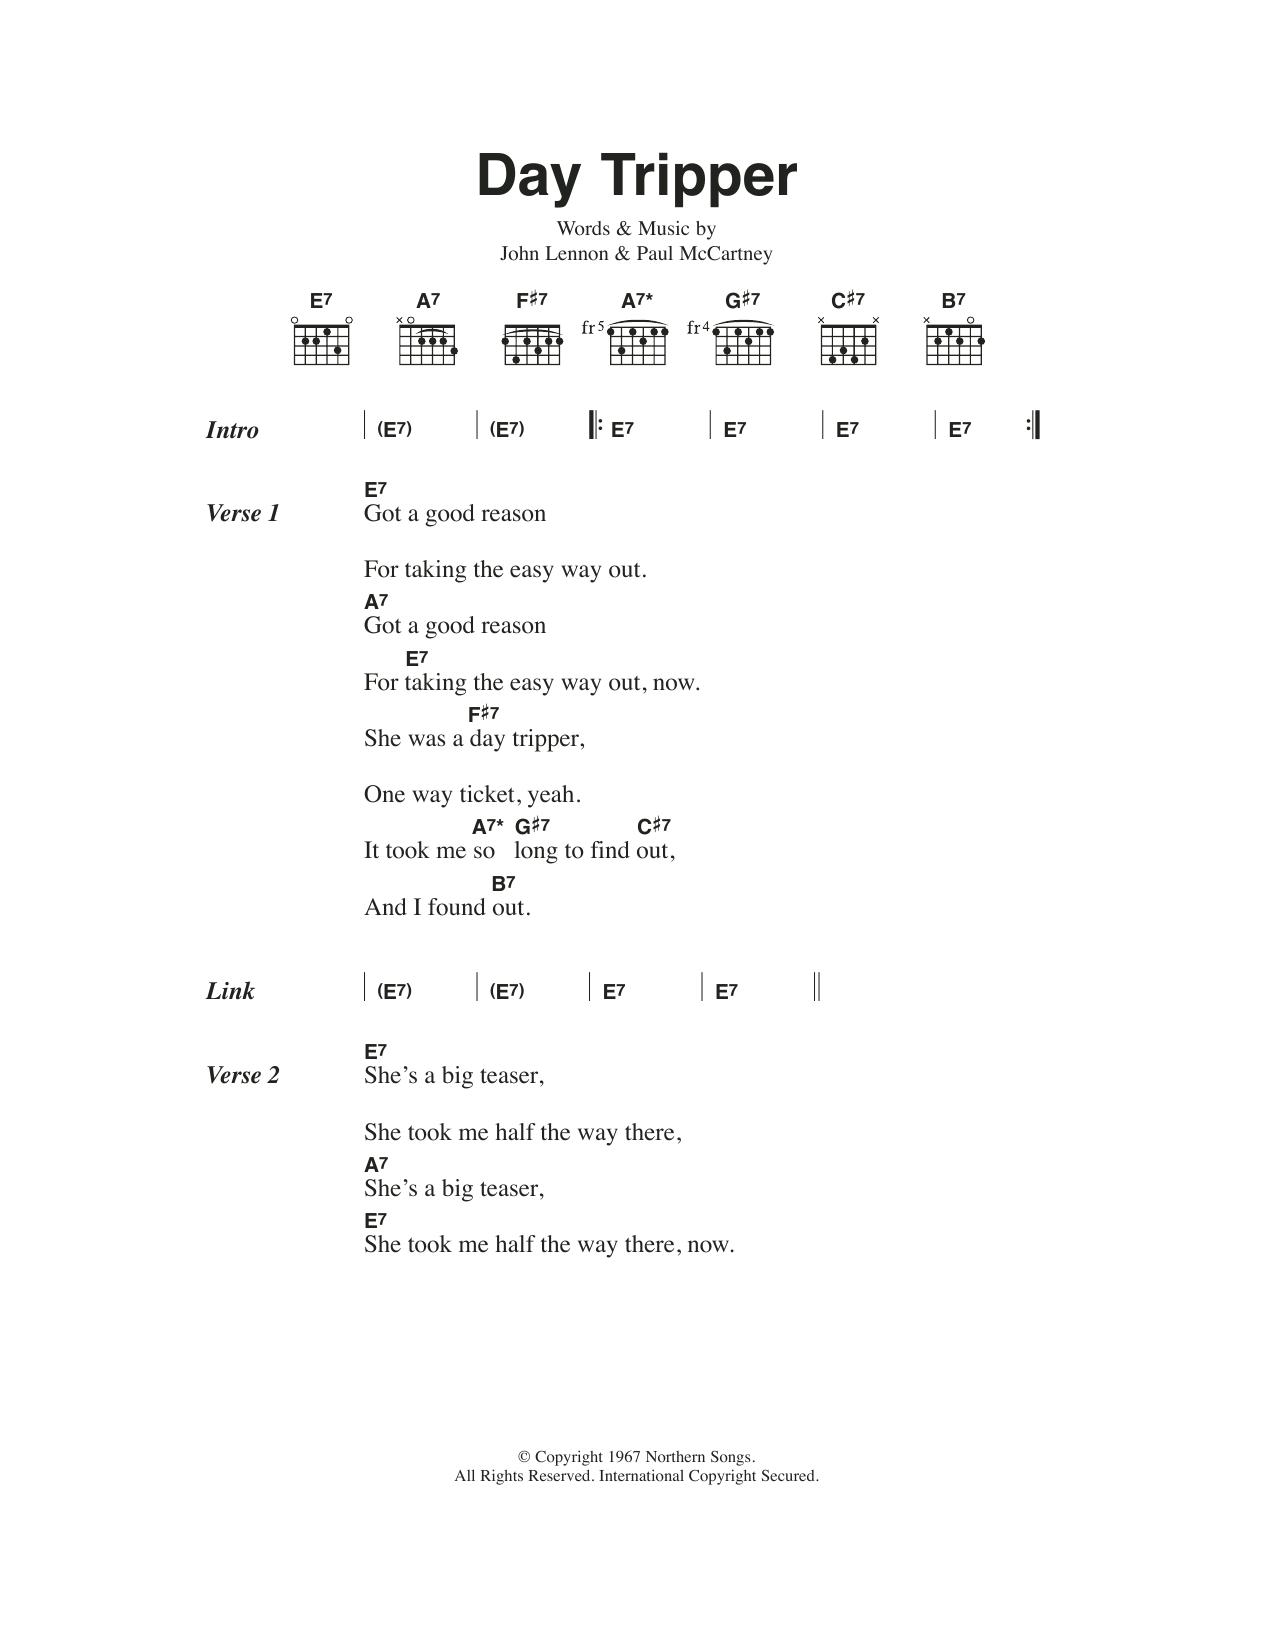 Day Tripper Sheet Music The Beatles Lyrics Chords